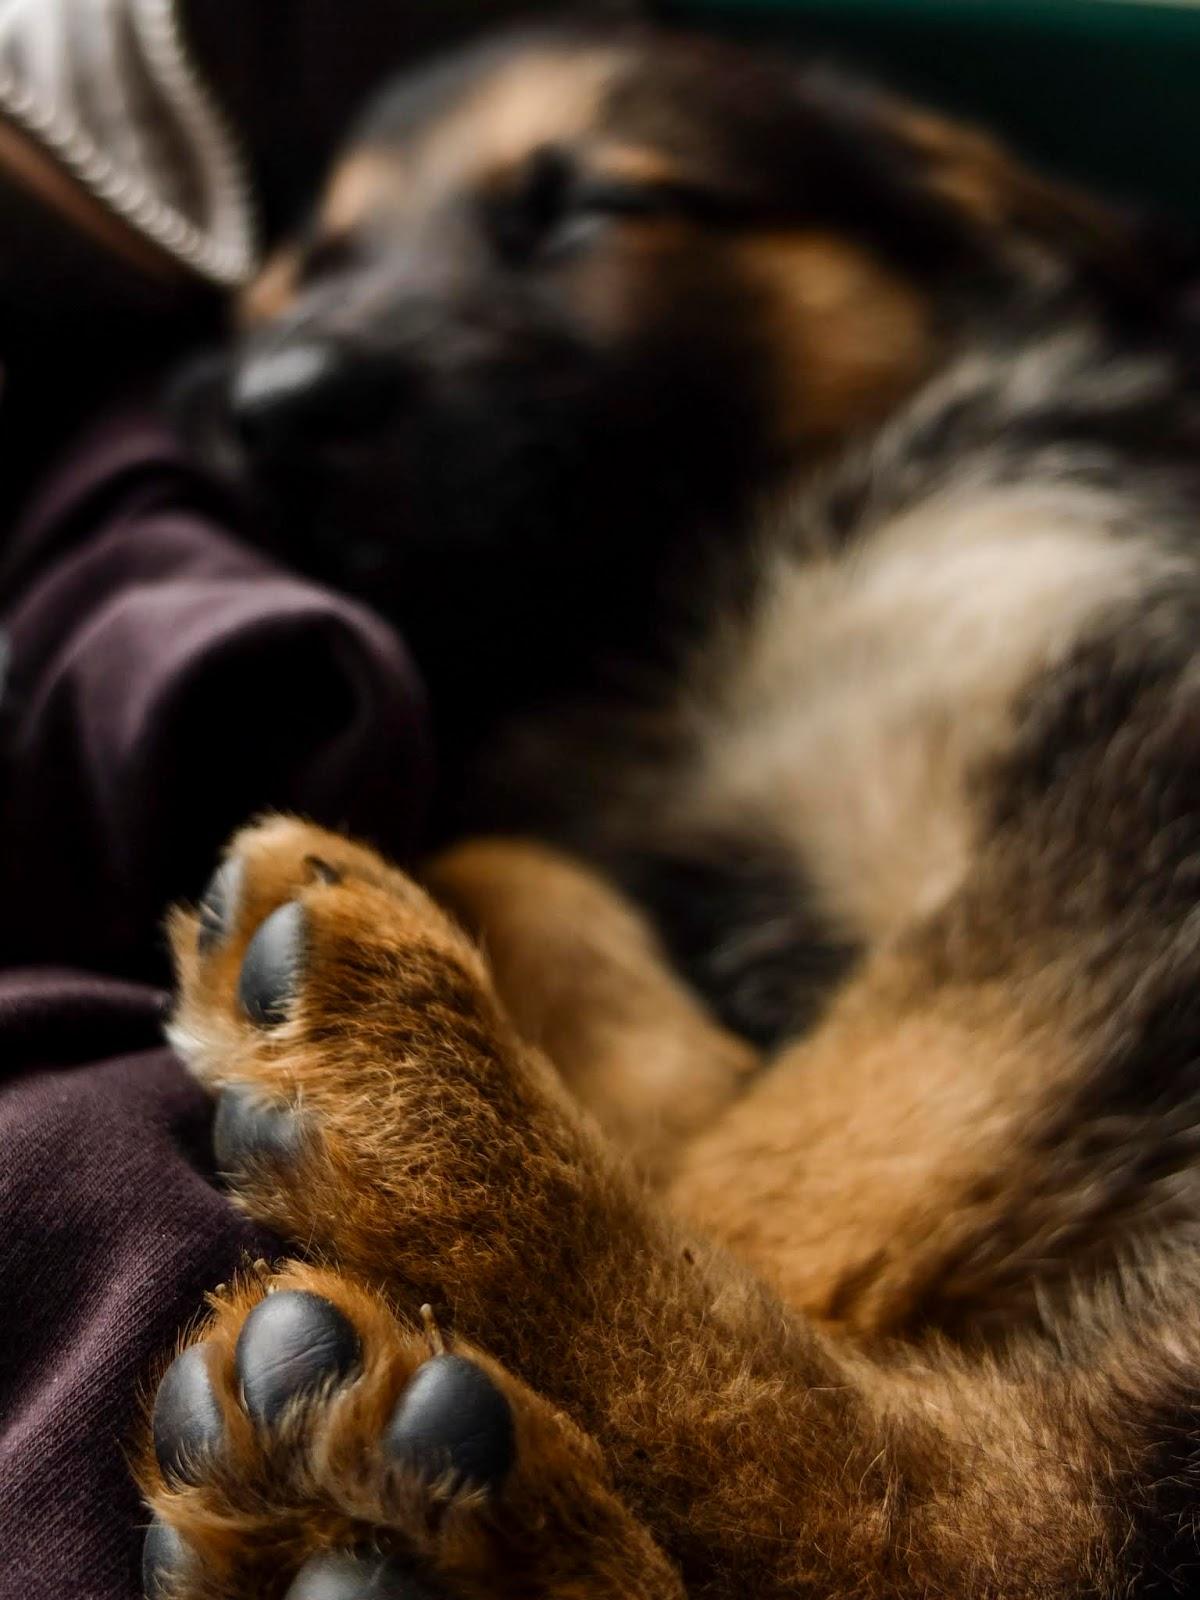 Close up of a sleeping German Shepherd puppy's feet.